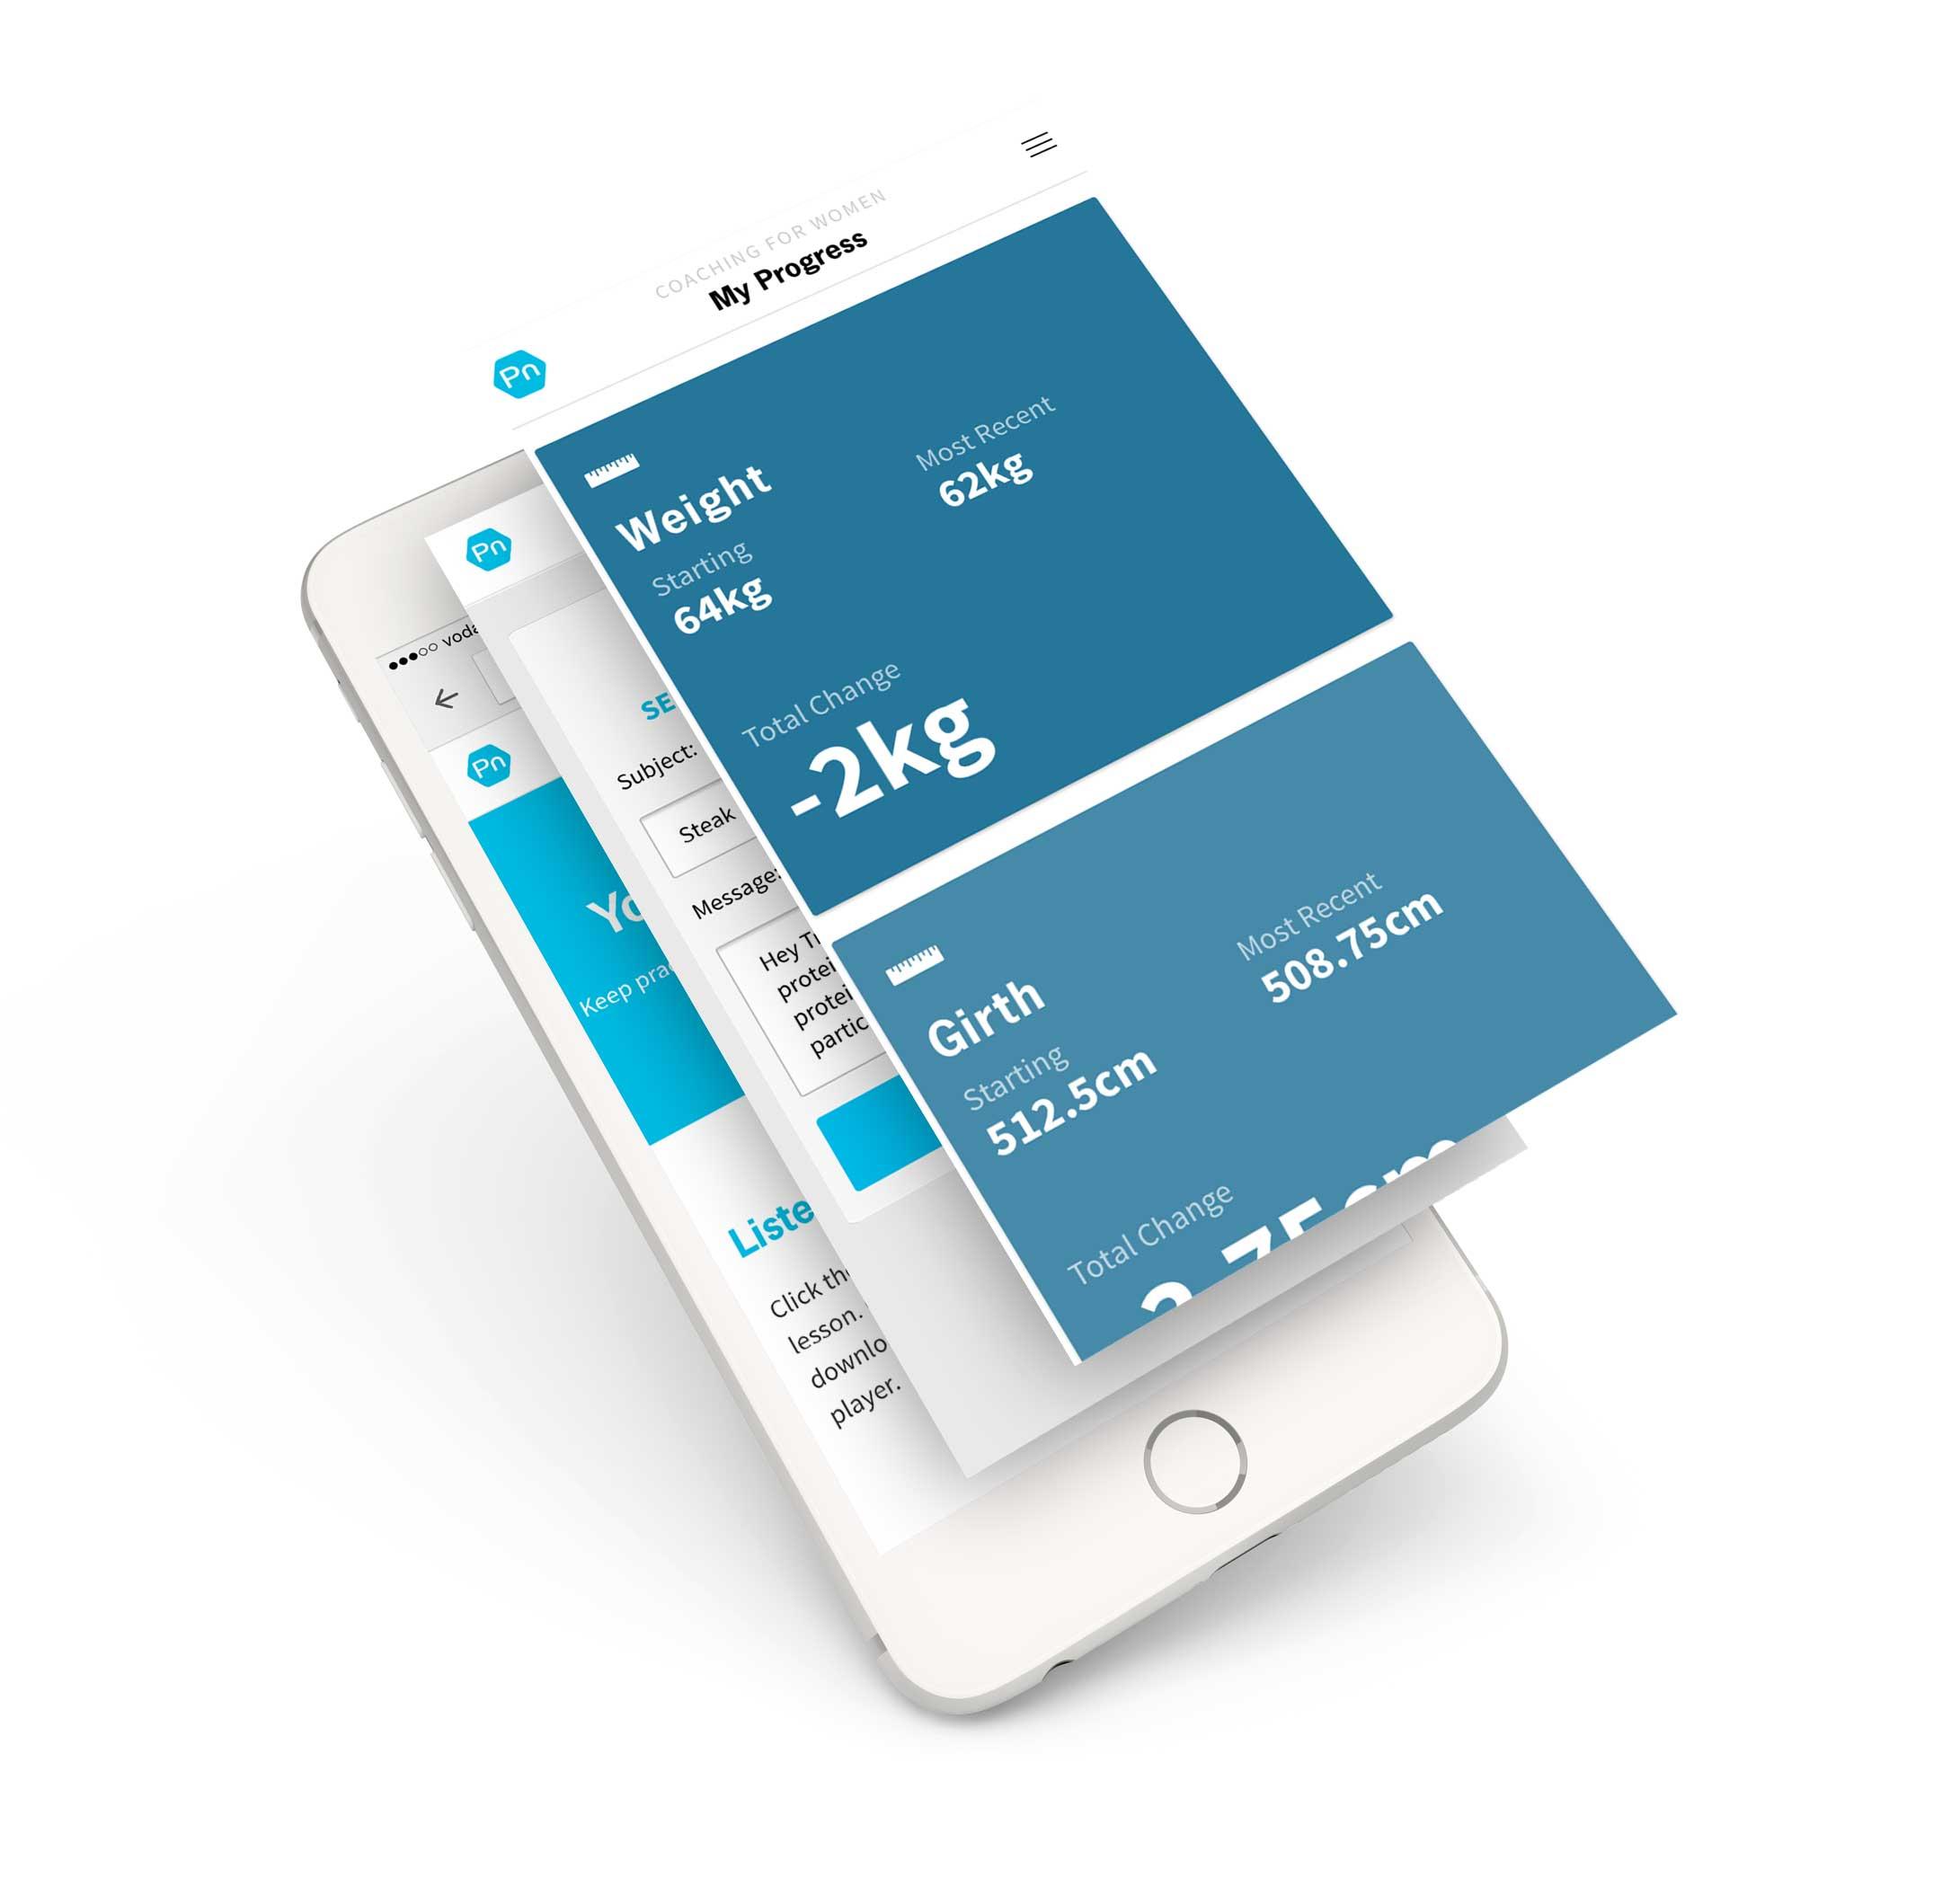 iPhone-6-App-Screen-PSD-Mockup-tickets.jpg